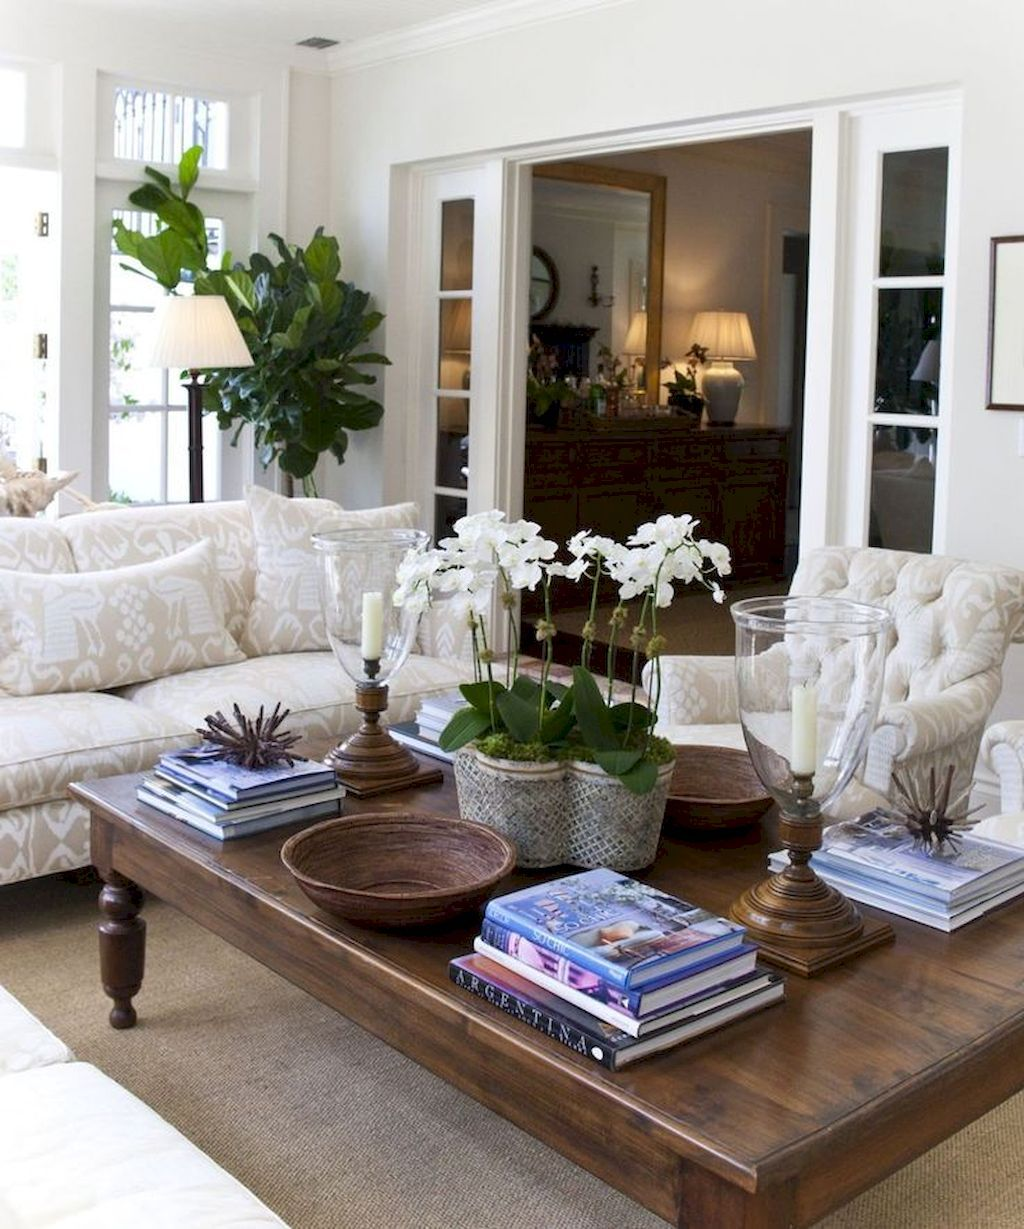 20 Super Modern Living Room Coffee Table Decor Ideas That: Cool 80 Rustic Coffee Table Ideas Https://decorapatio.com